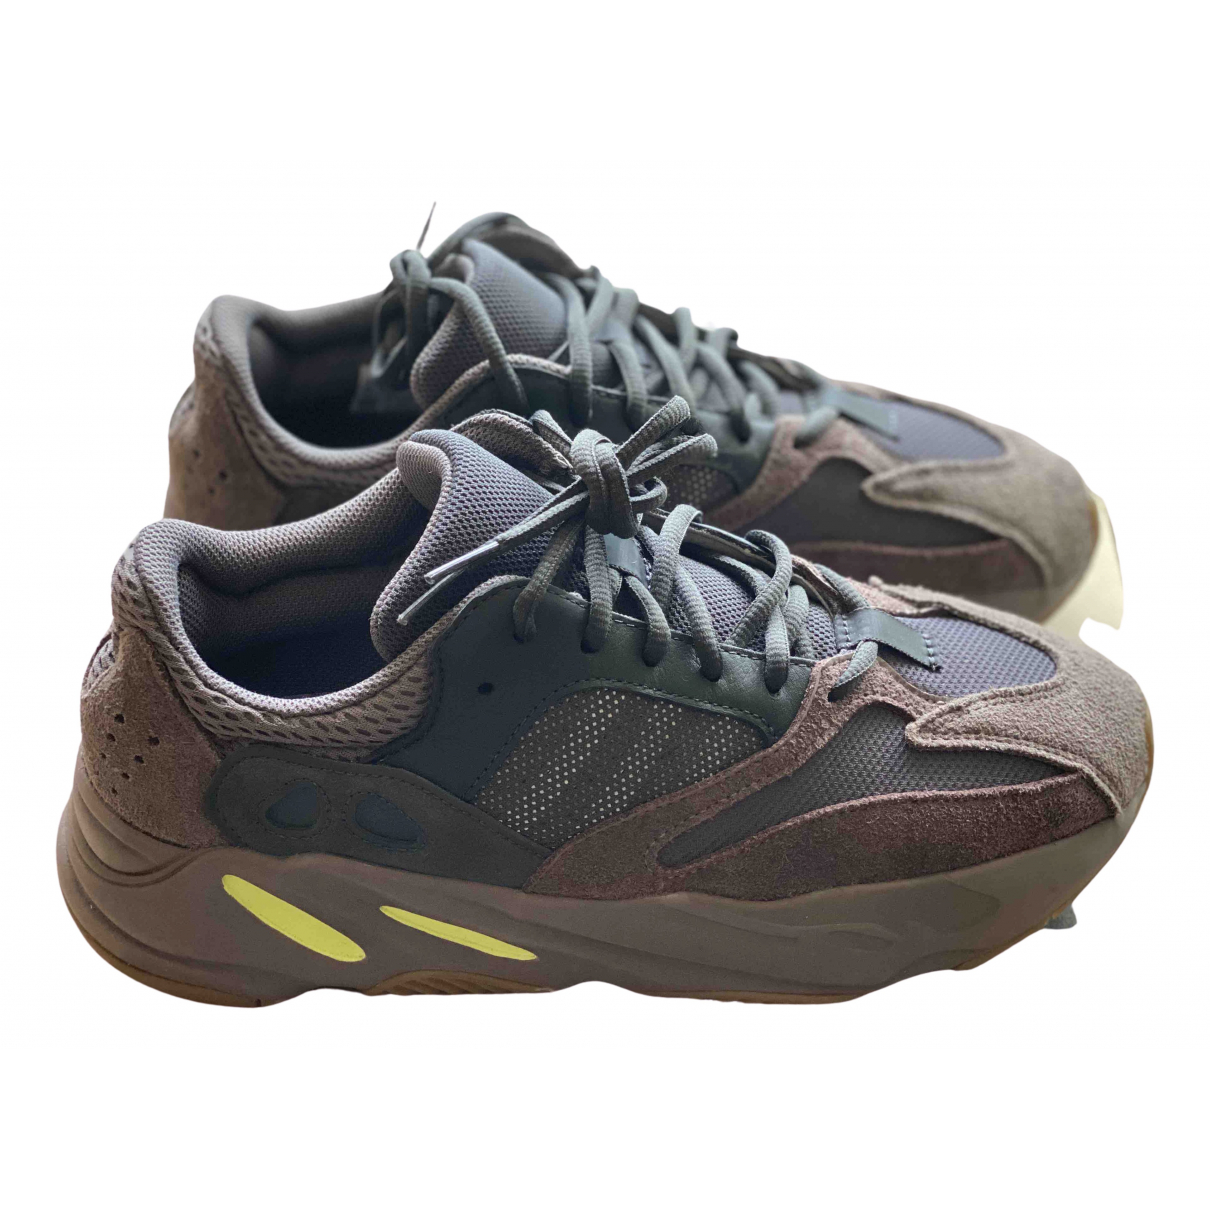 Yeezy X Adidas Boost 700 V1  Sneakers in  Braun Veloursleder